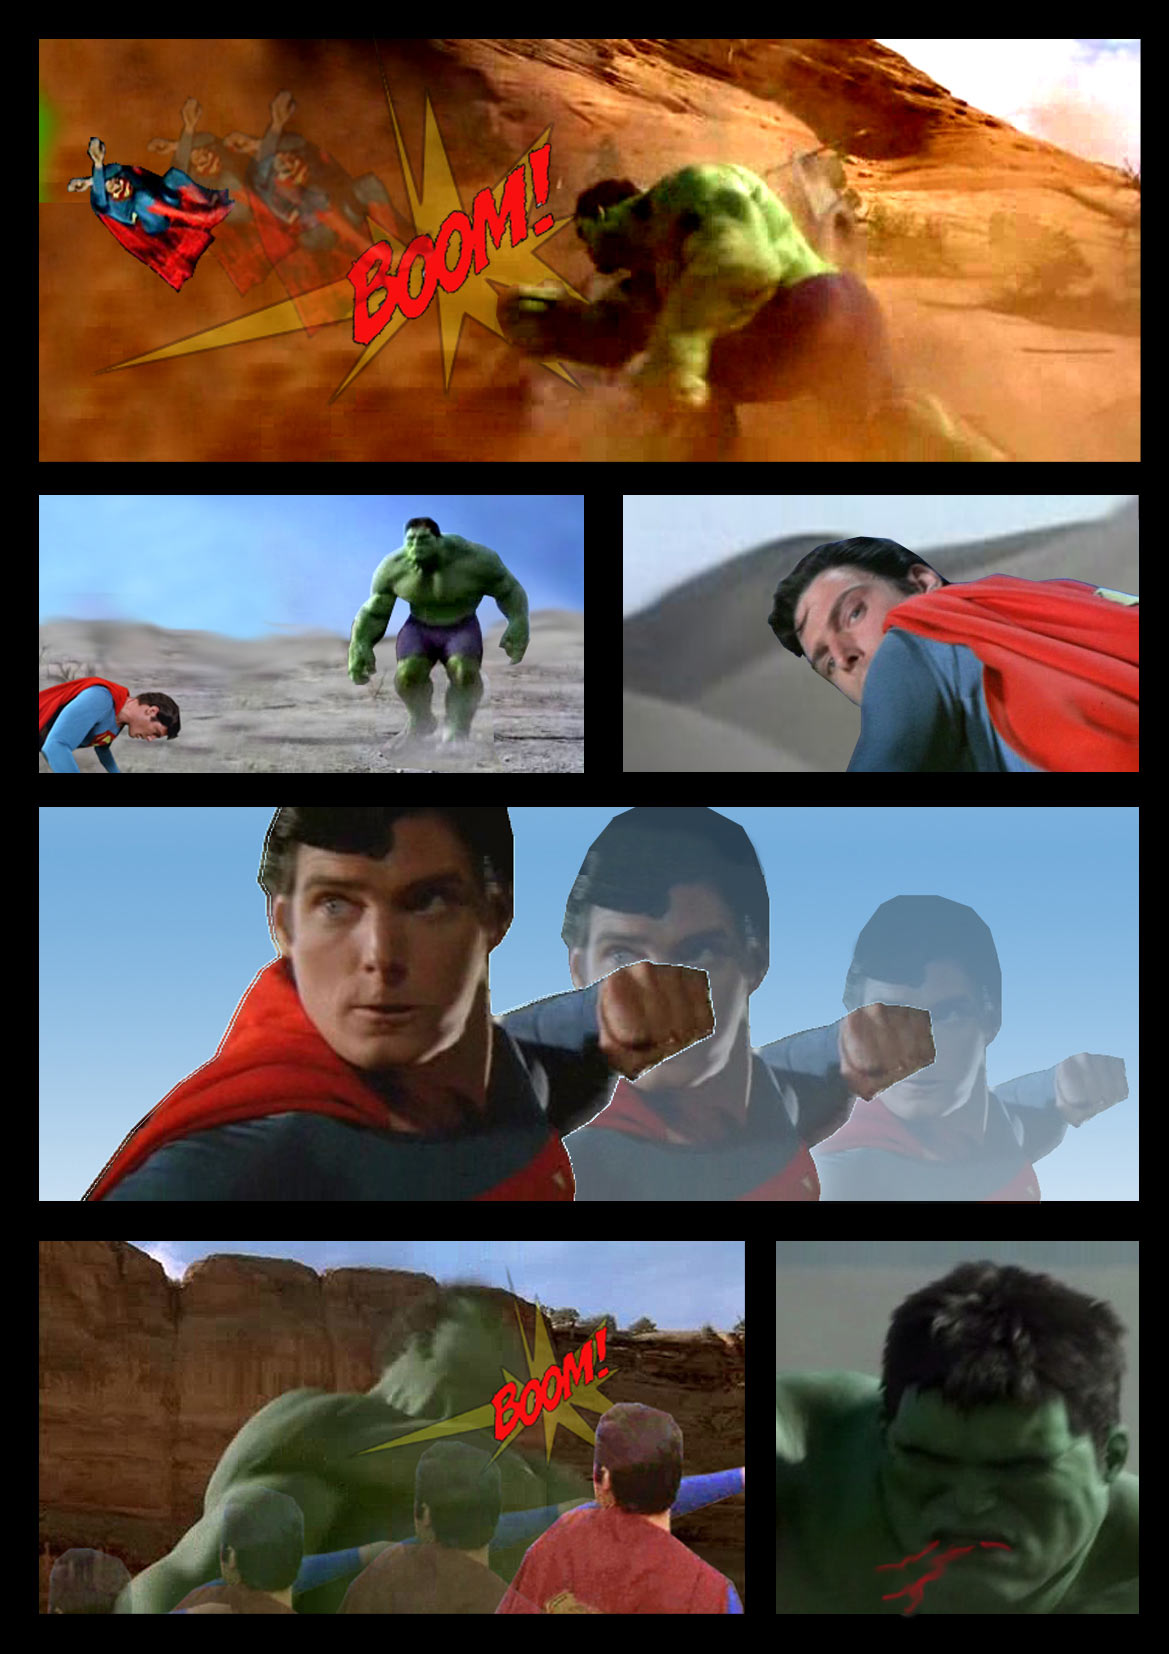 combat4.jpg